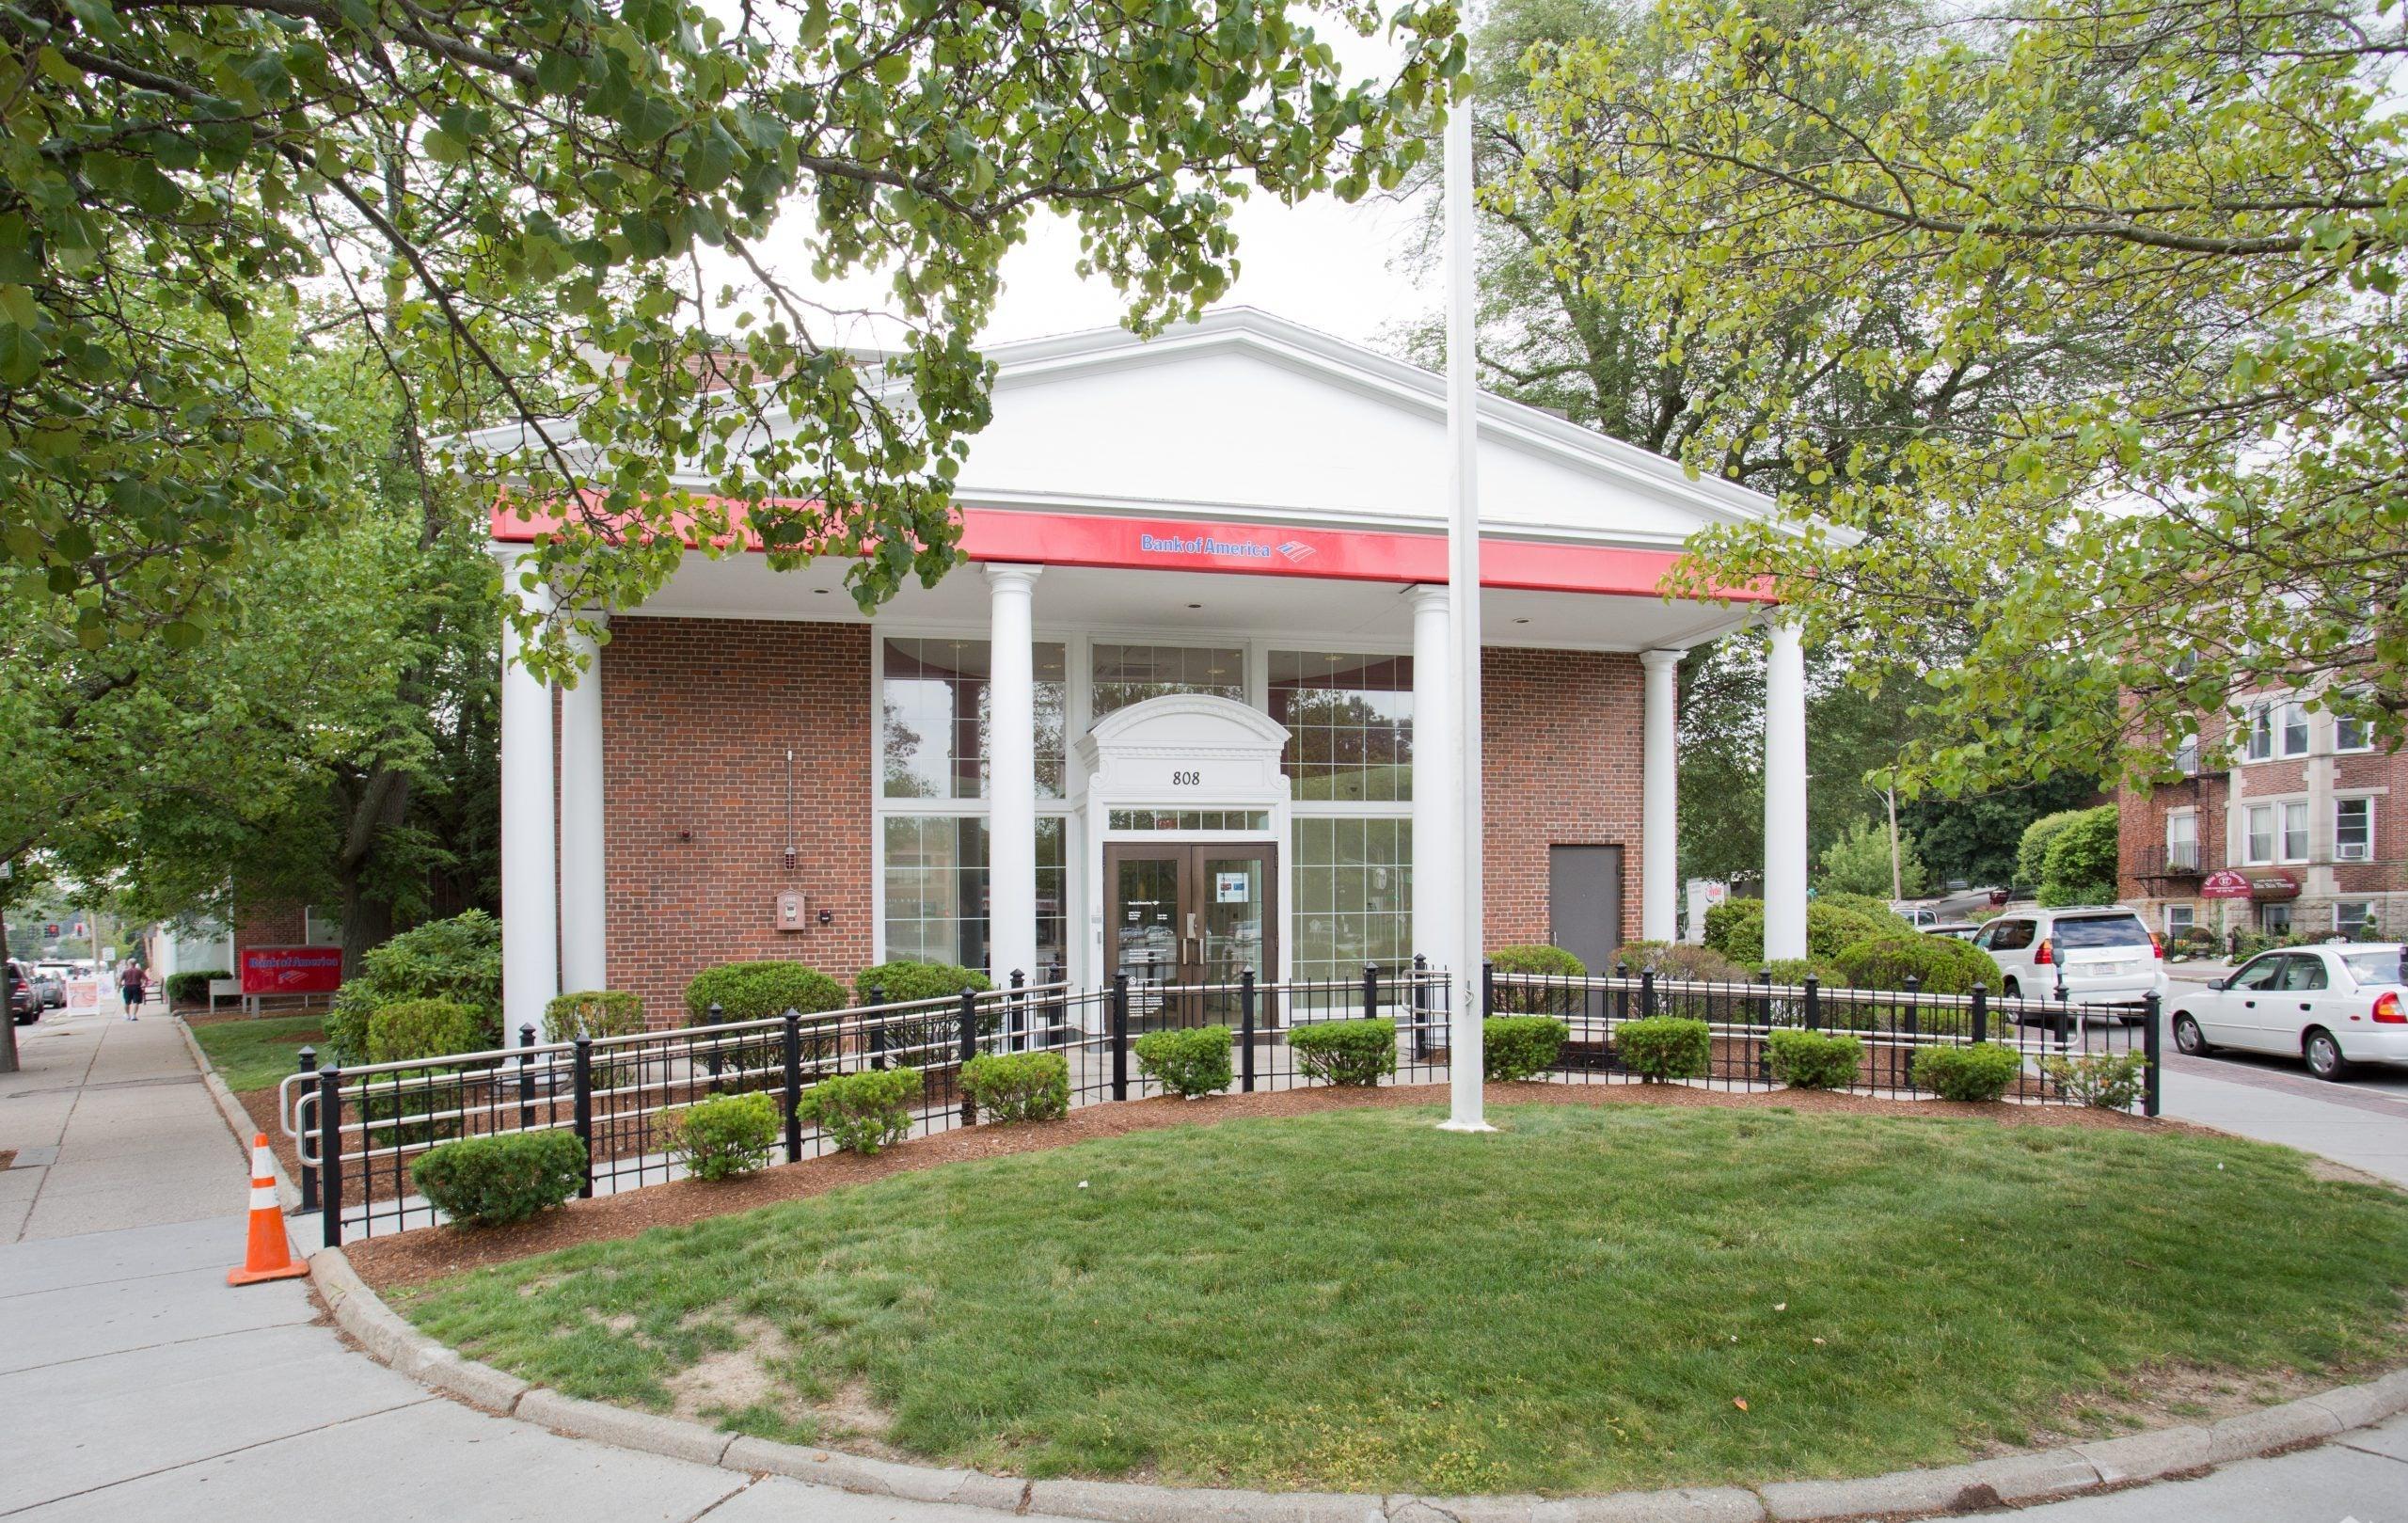 Bank of America – Branch Renovations